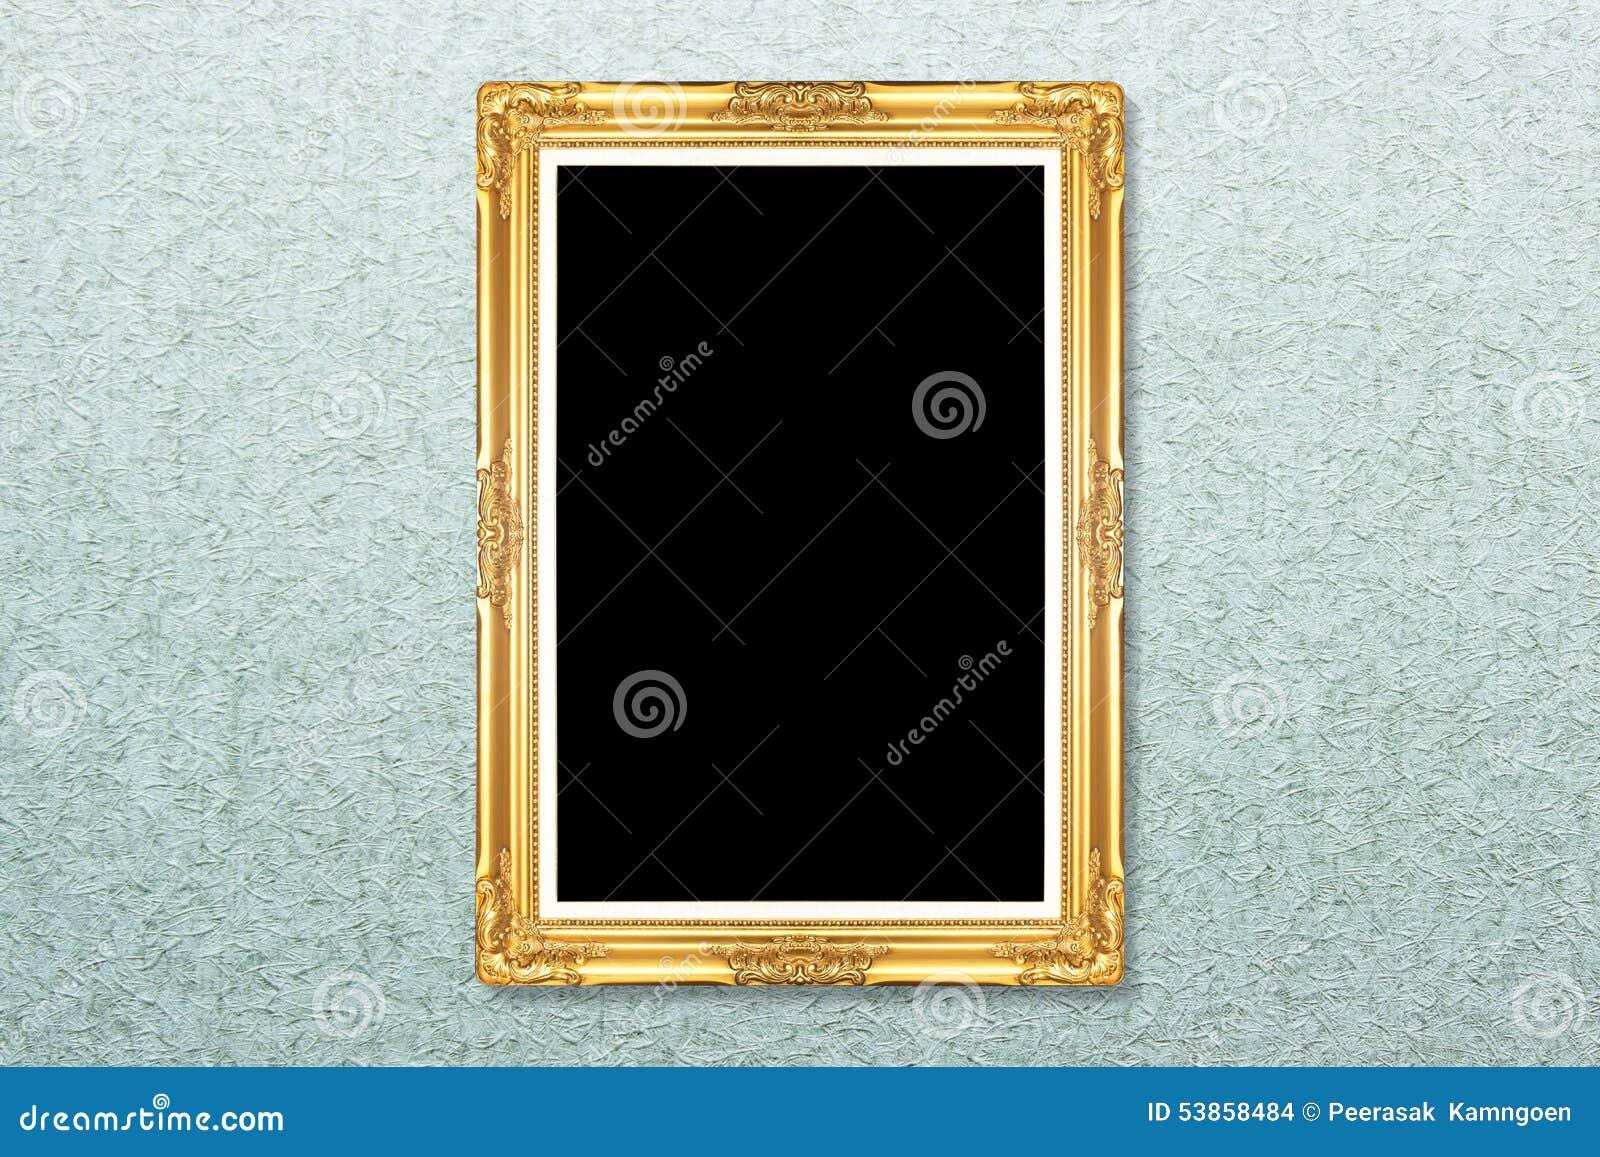 Empty Golden Vintage Frame On Wallpaper Stock Photo Image Of Gilt